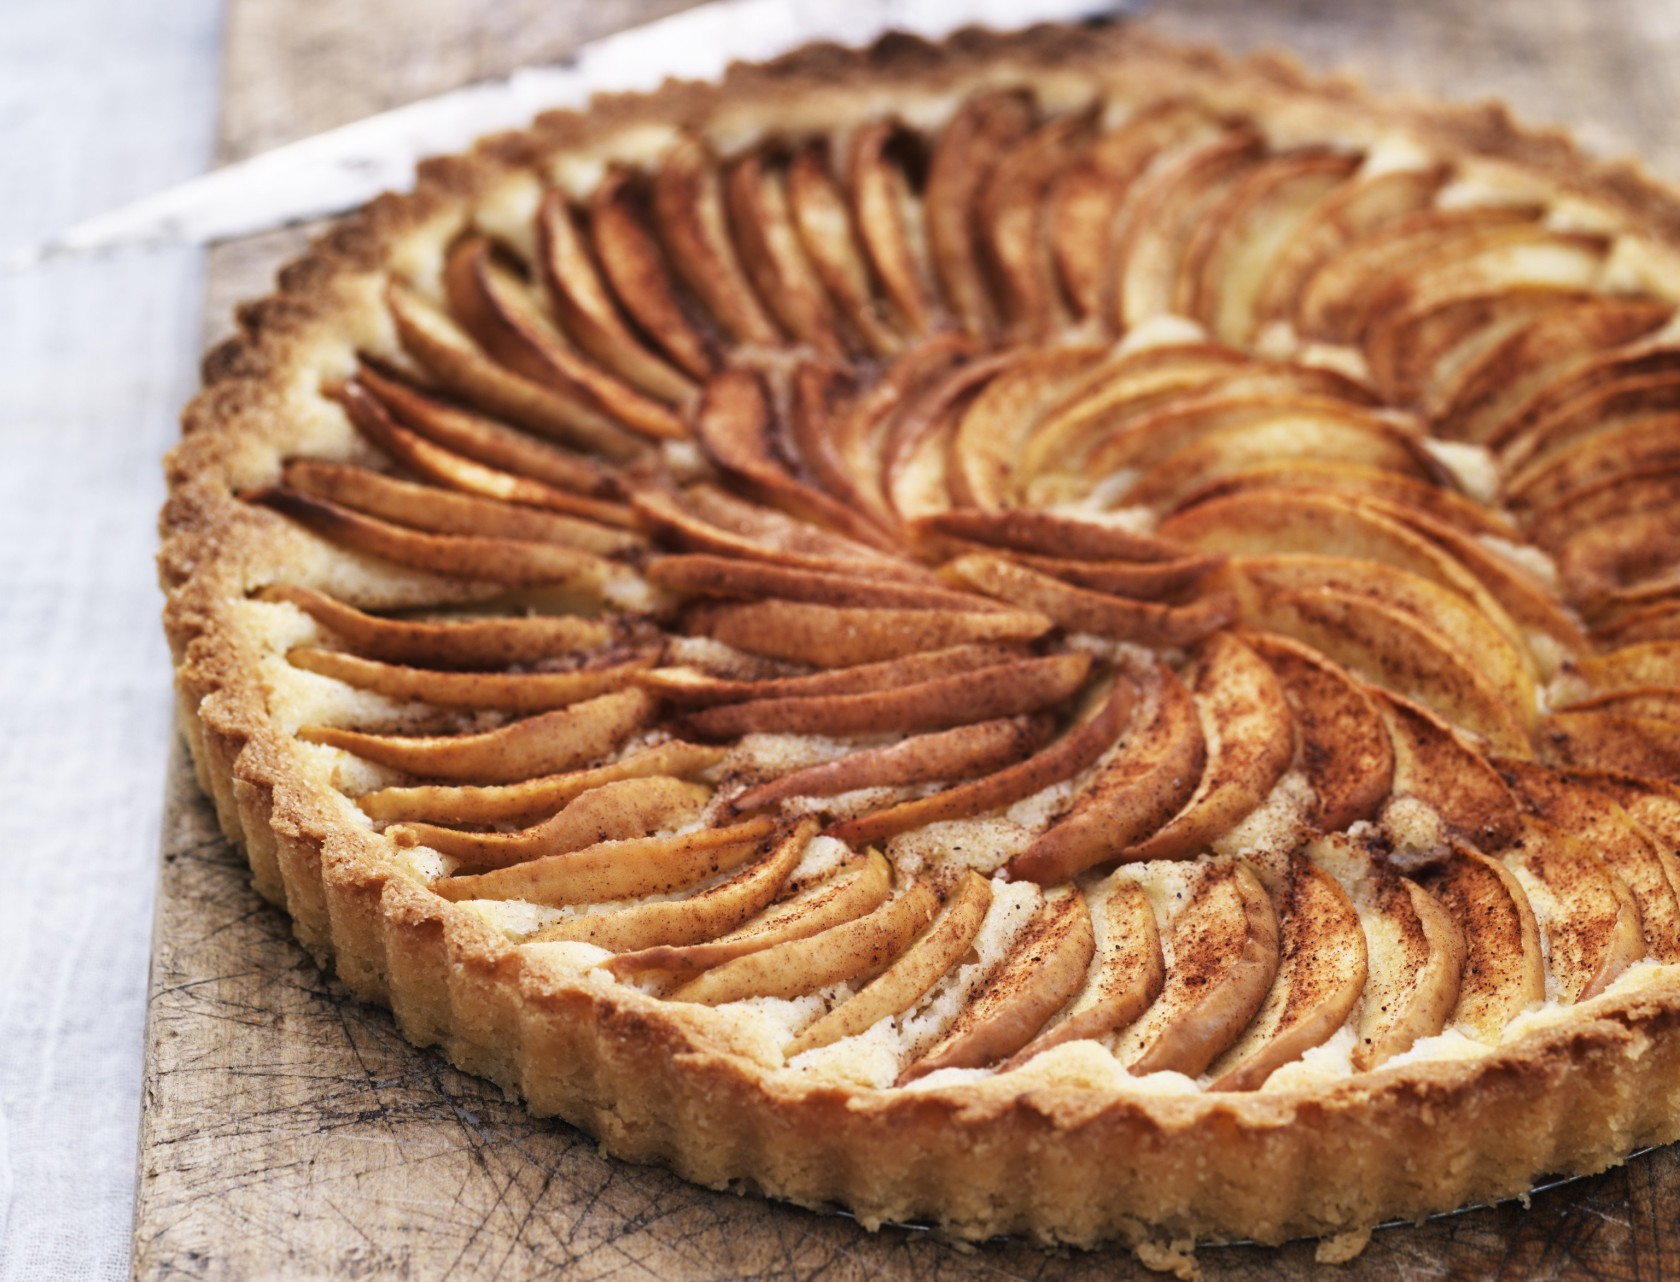 Æbletærte med kanelsukker